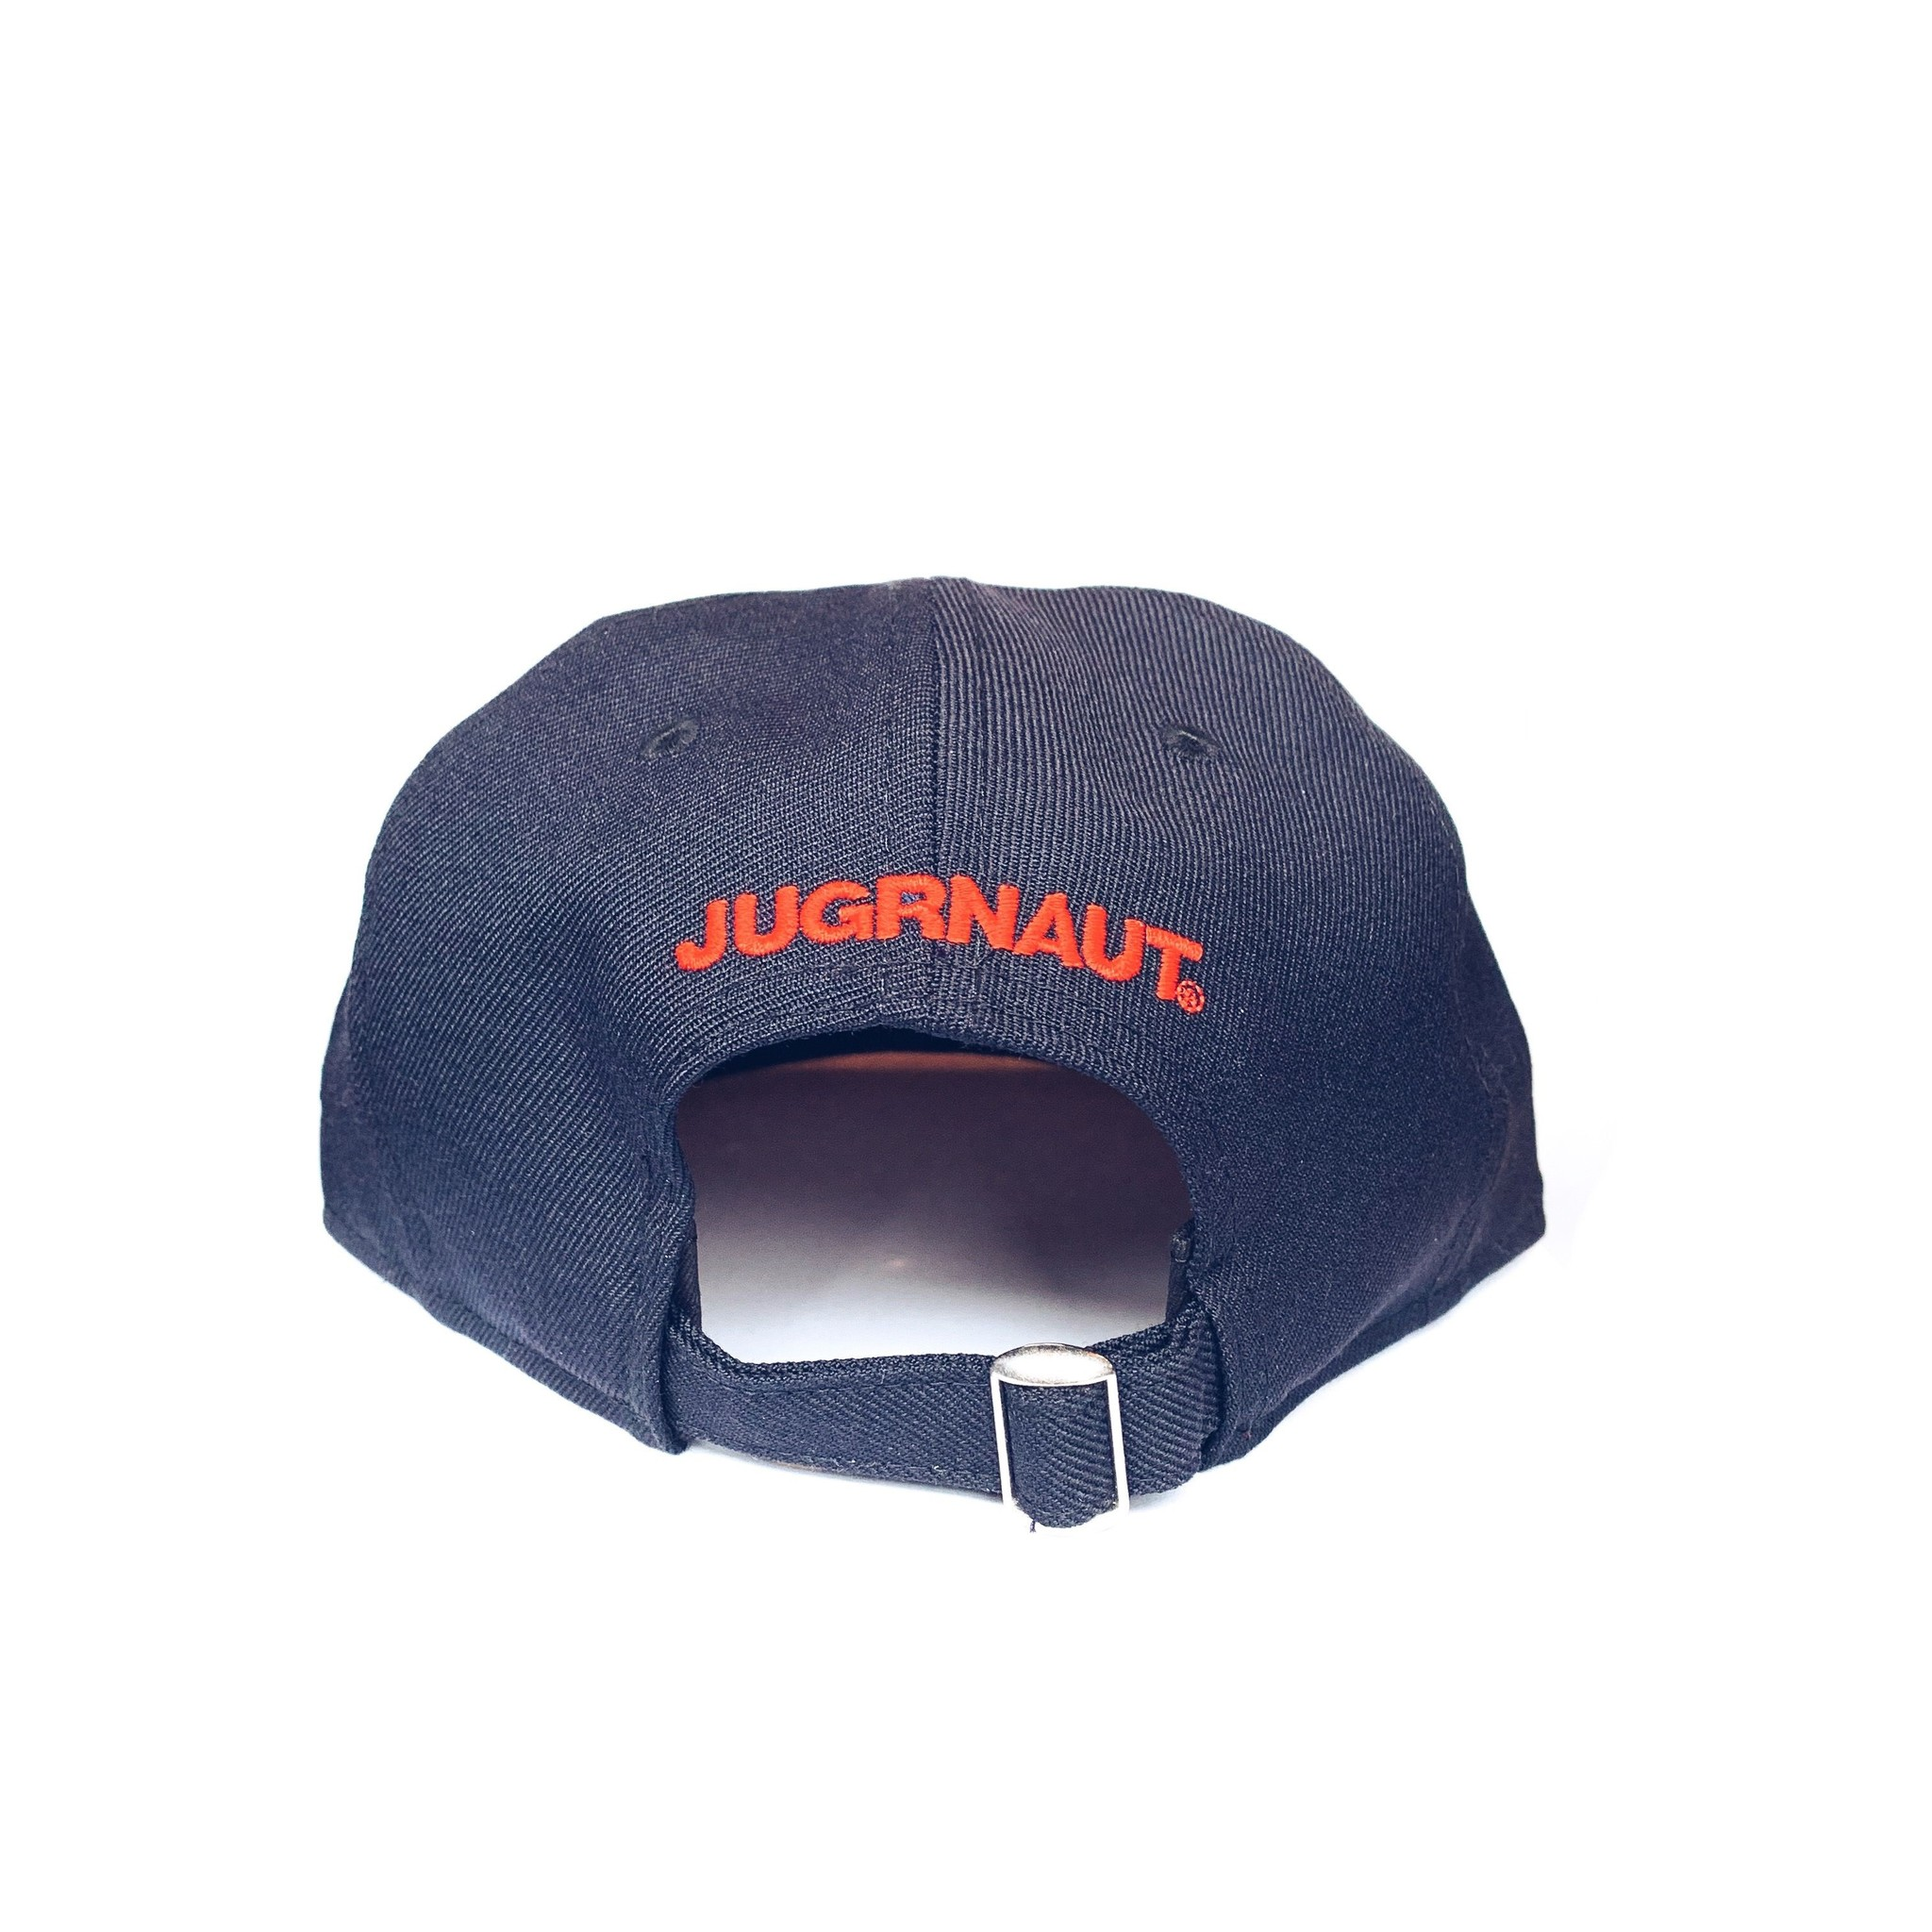 Jugrnaut Jugrnaut x New Era J Storm Hat Navy